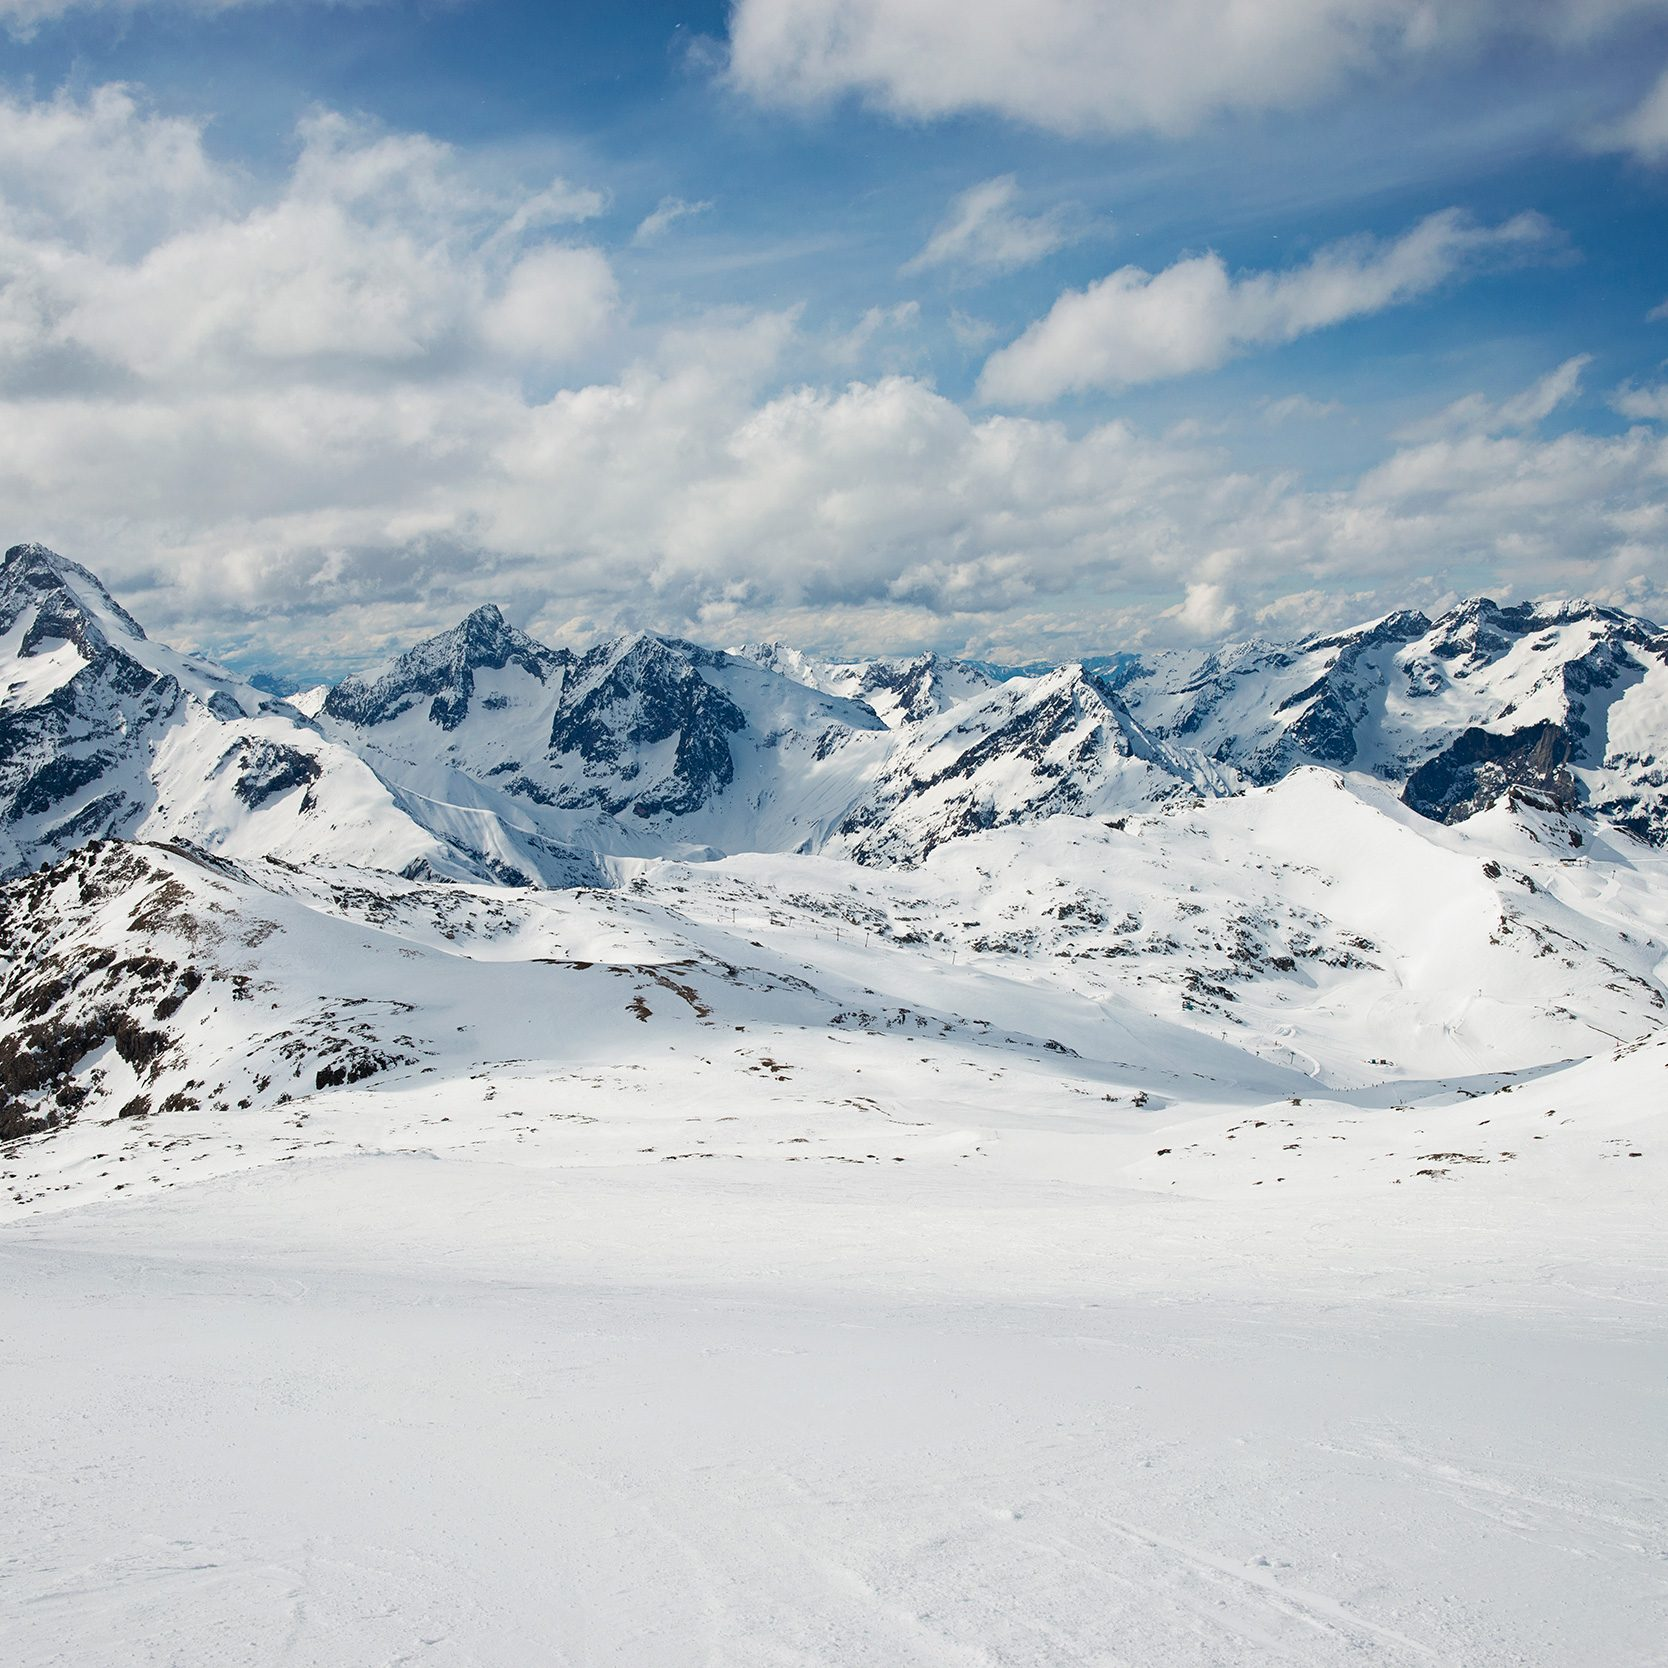 Les 2 alpes france europe travel montagne mountain neige snow ski sports d'hiver travel voyage pics sommets